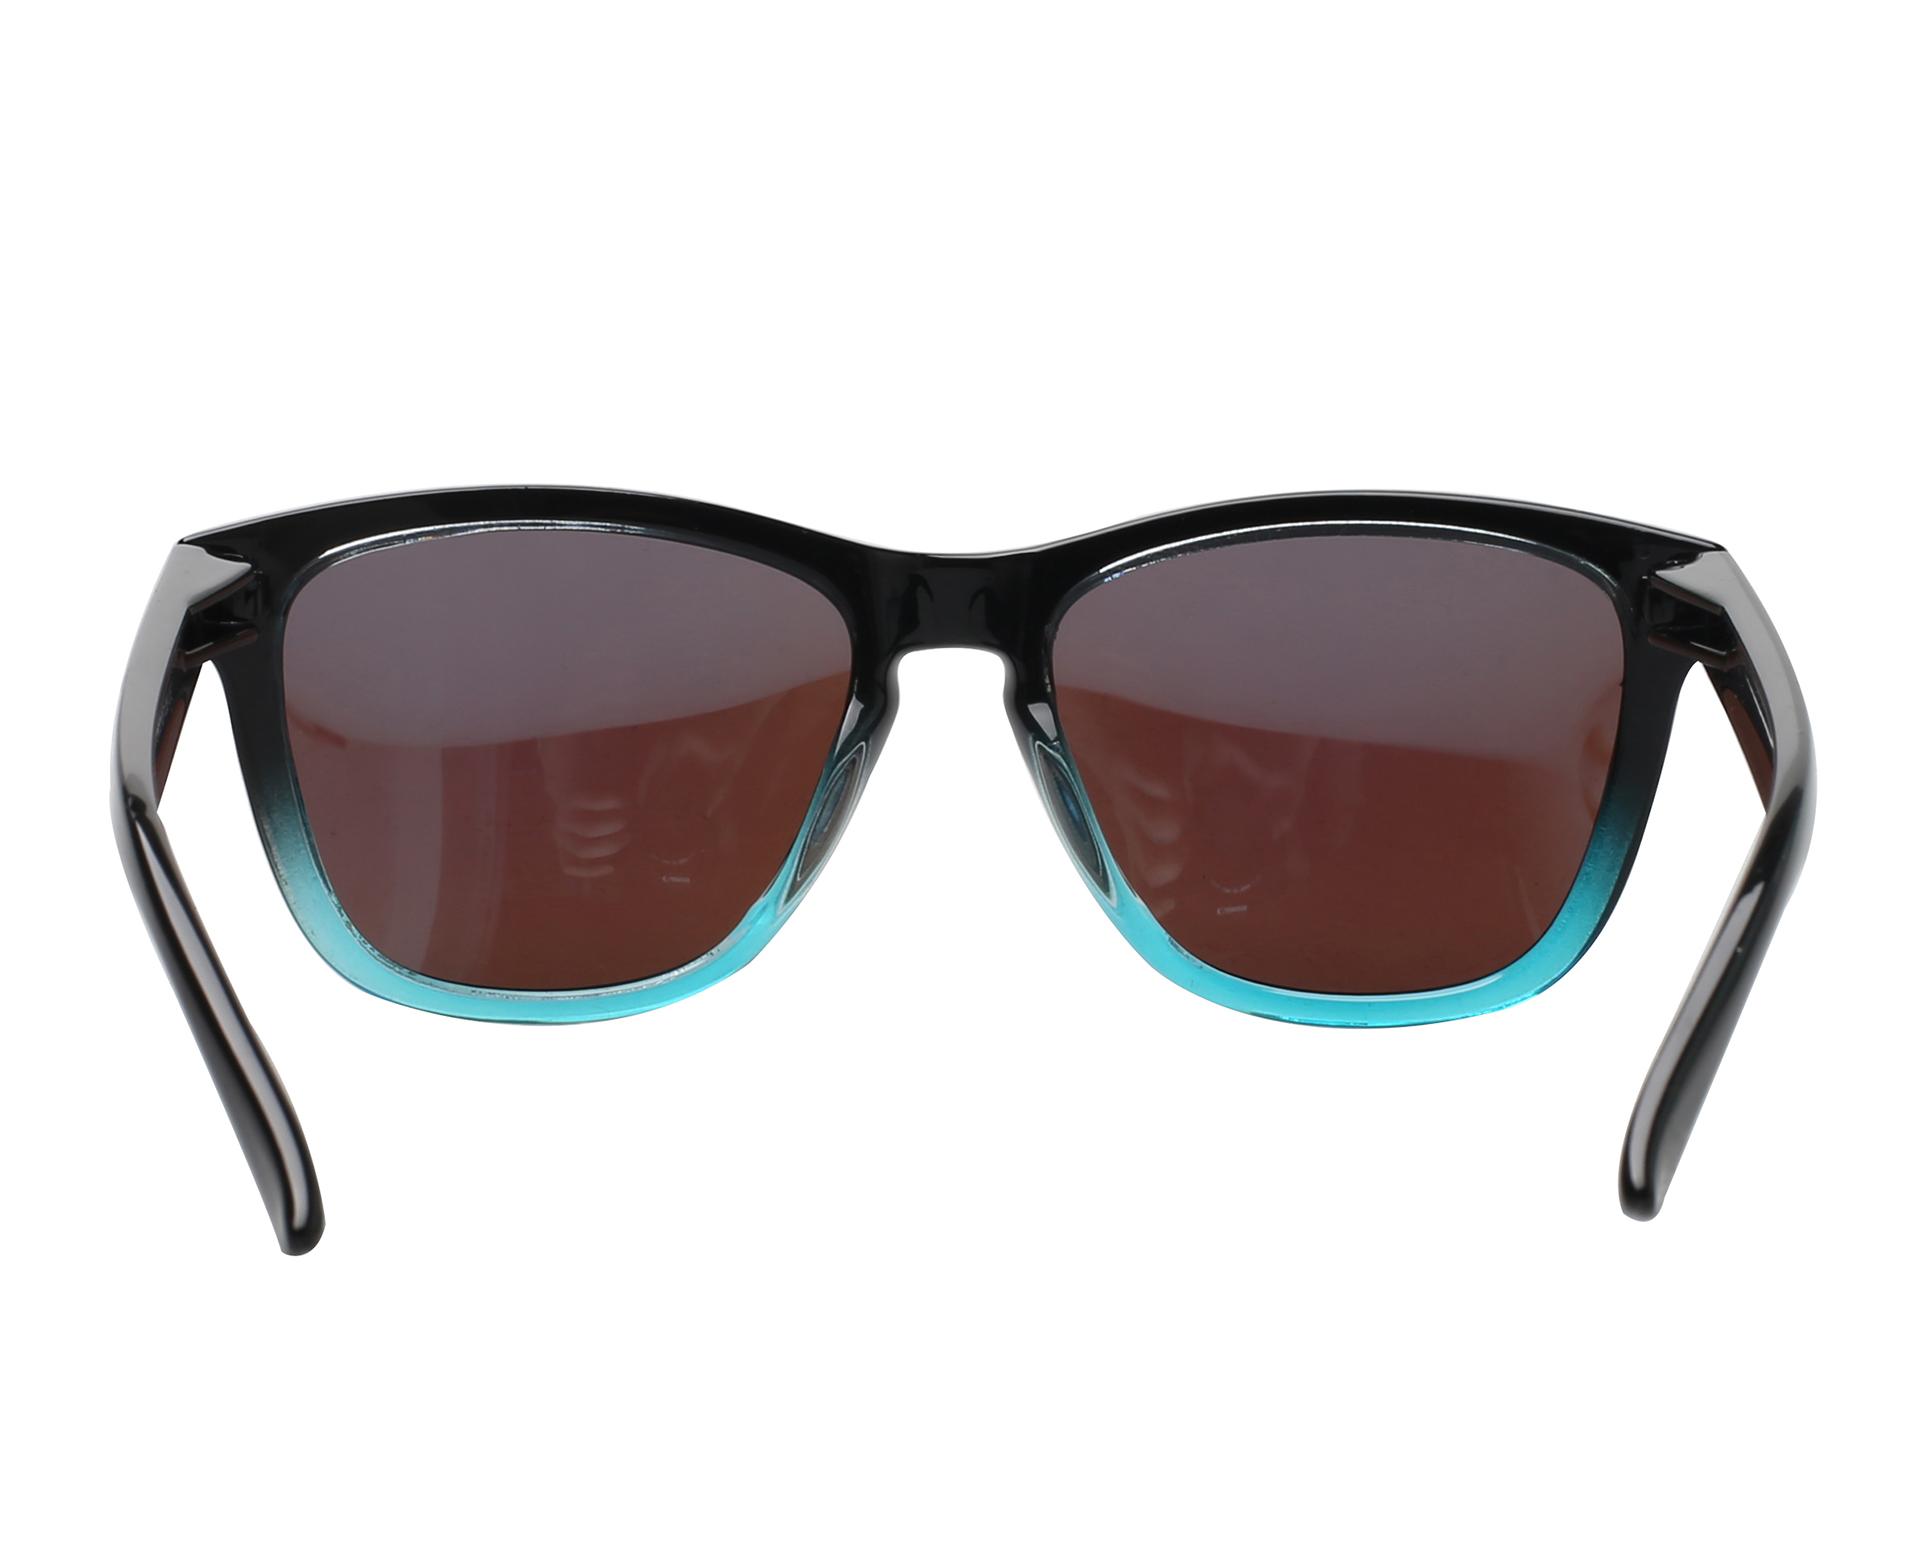 mybeautyworld24 sonnenbrille nerdbrille sonnenbrillen. Black Bedroom Furniture Sets. Home Design Ideas